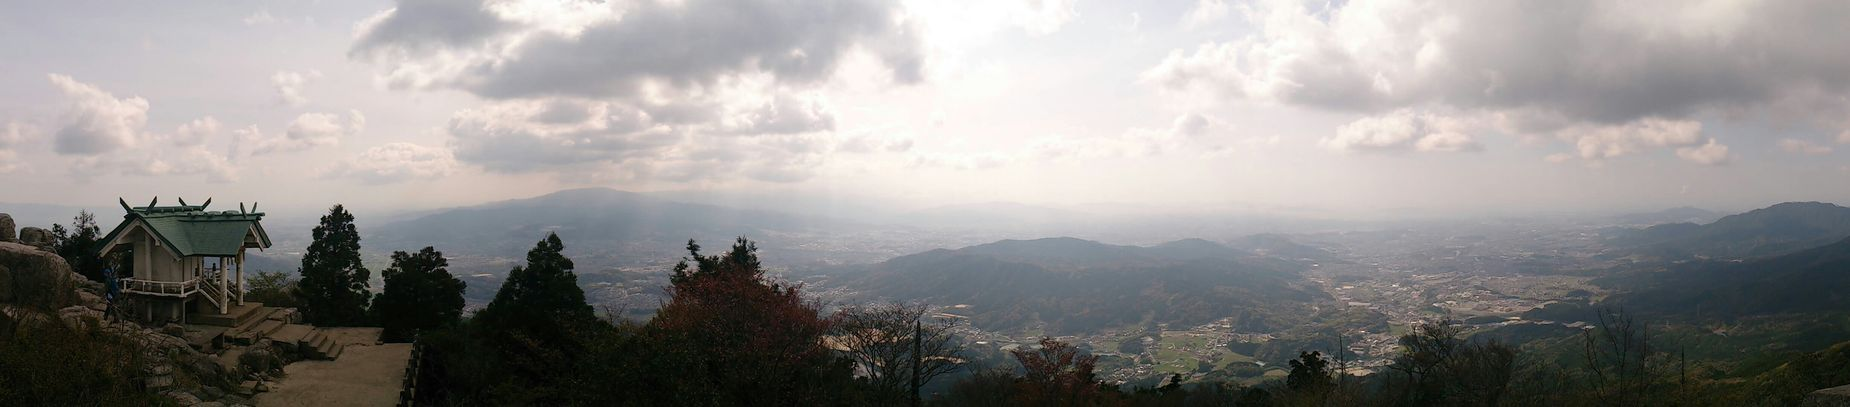 Climbing Landscape Mountain View Japanese Shrine 宝満山 竈門神社